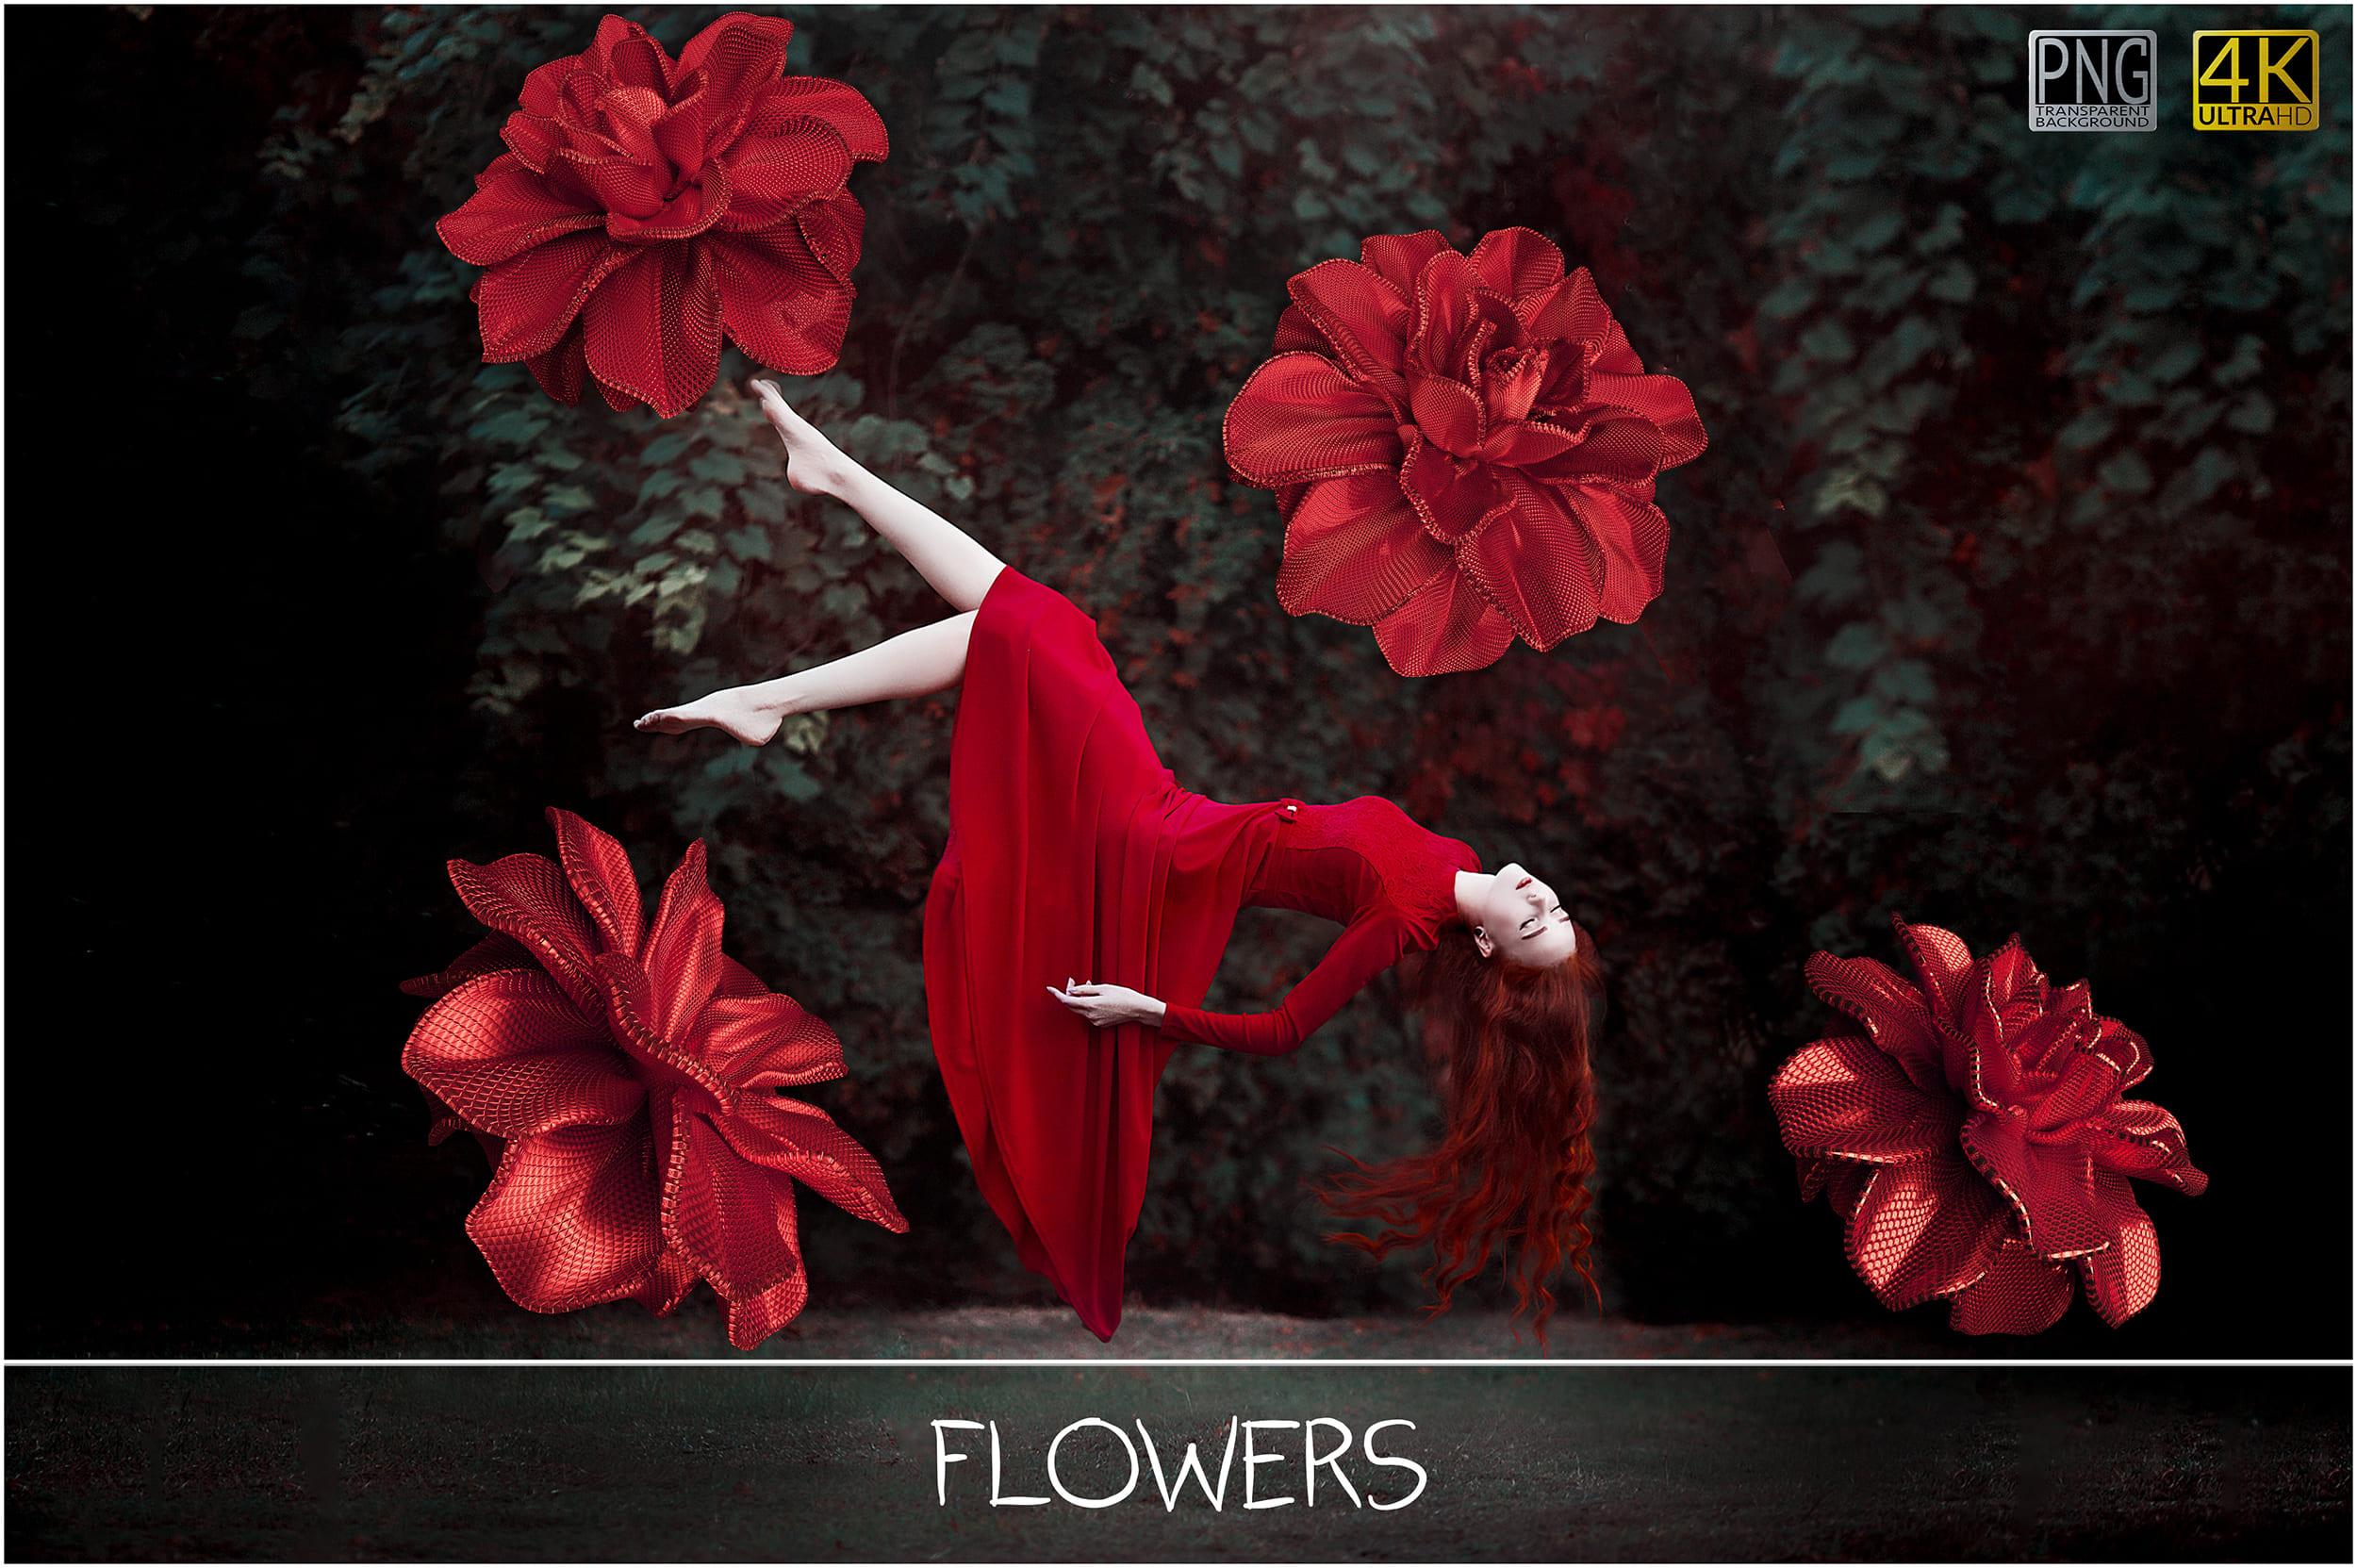 100 Flower Overlays PNG: Red Magenta Flowers - 12 ba main